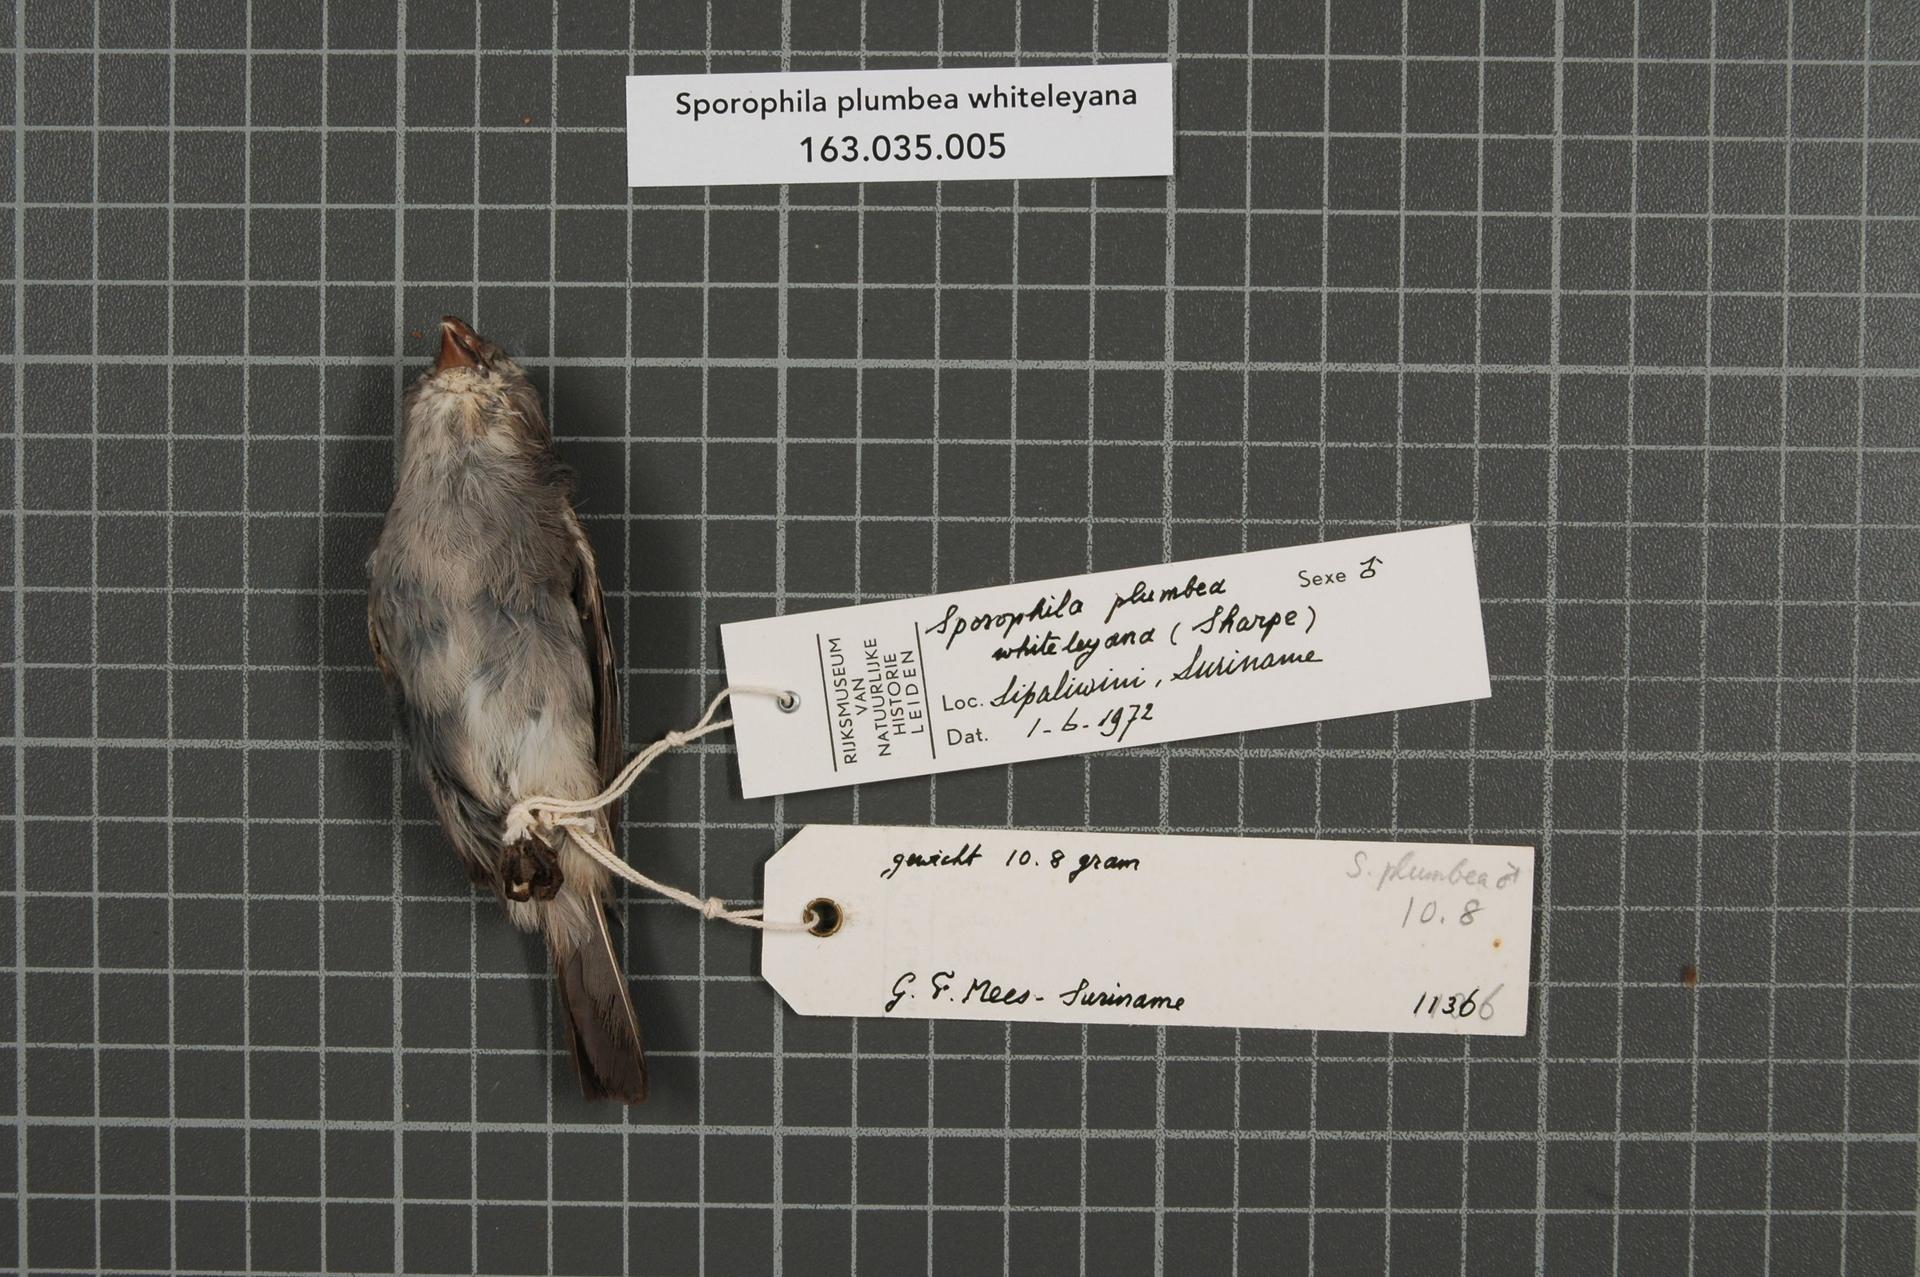 RMNH.AVES.72668   Sporophila plumbea whiteleyana (Sharpe, 1888)